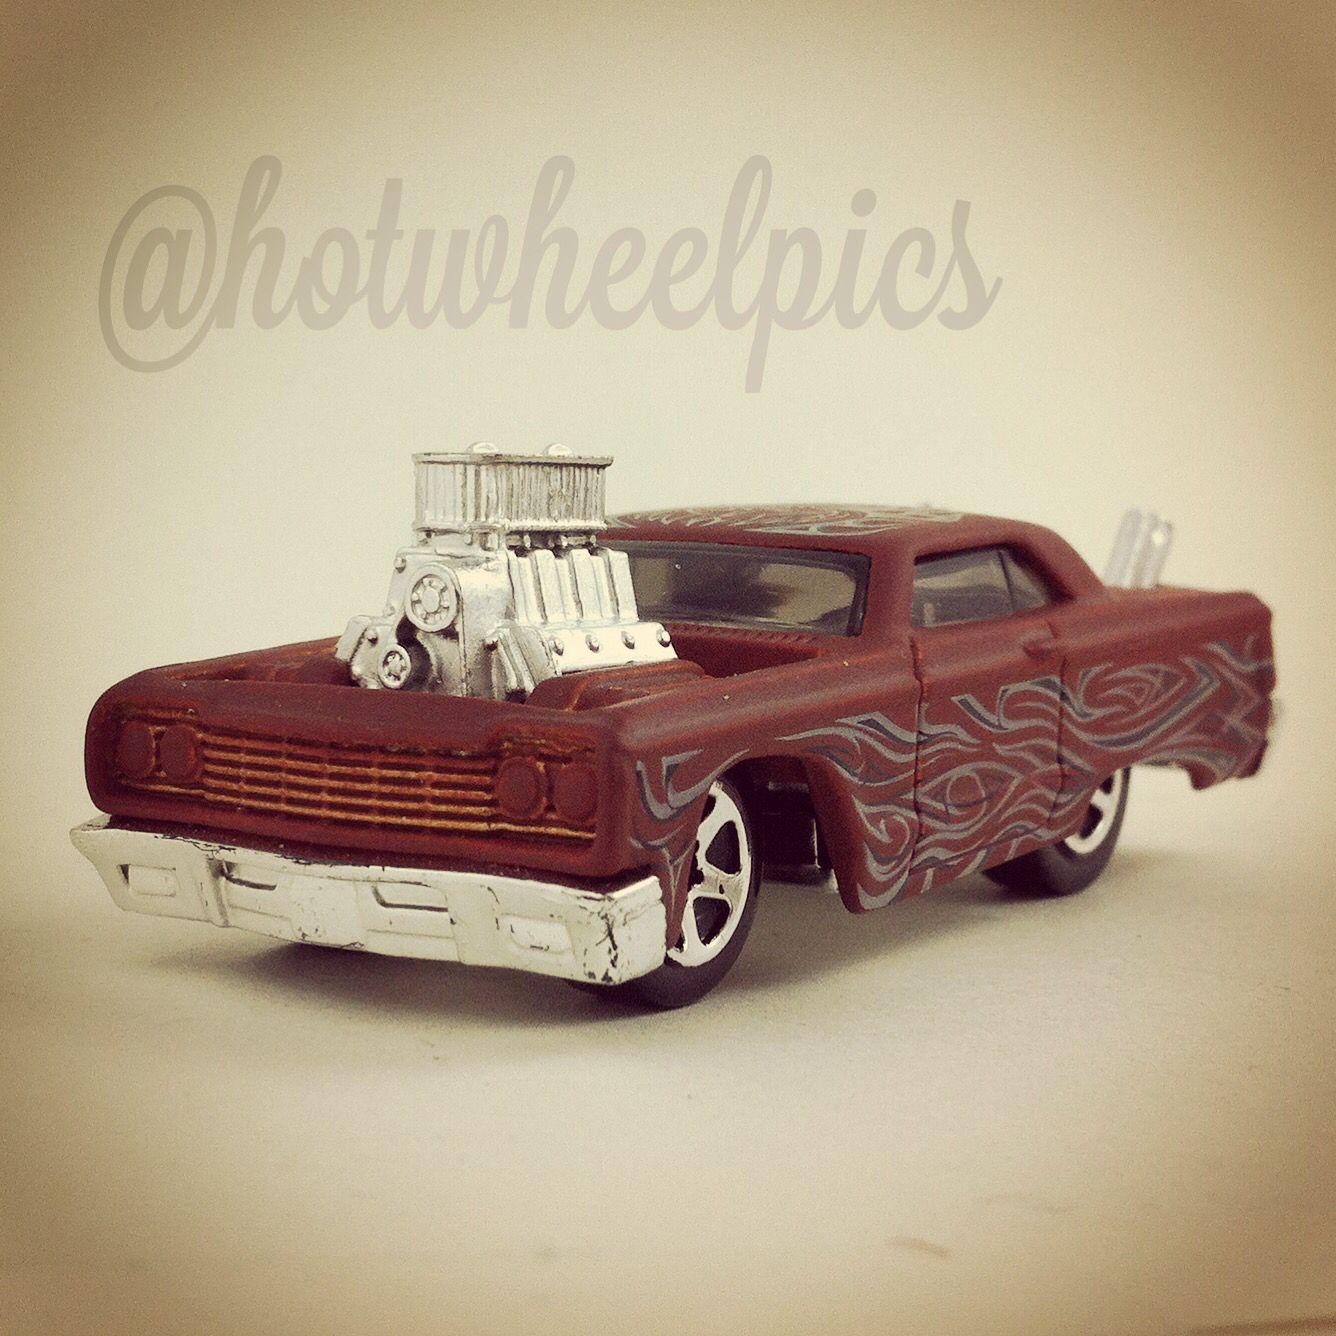 tooned 64 chevy impala 2004 hot wheels hotwheels diecast